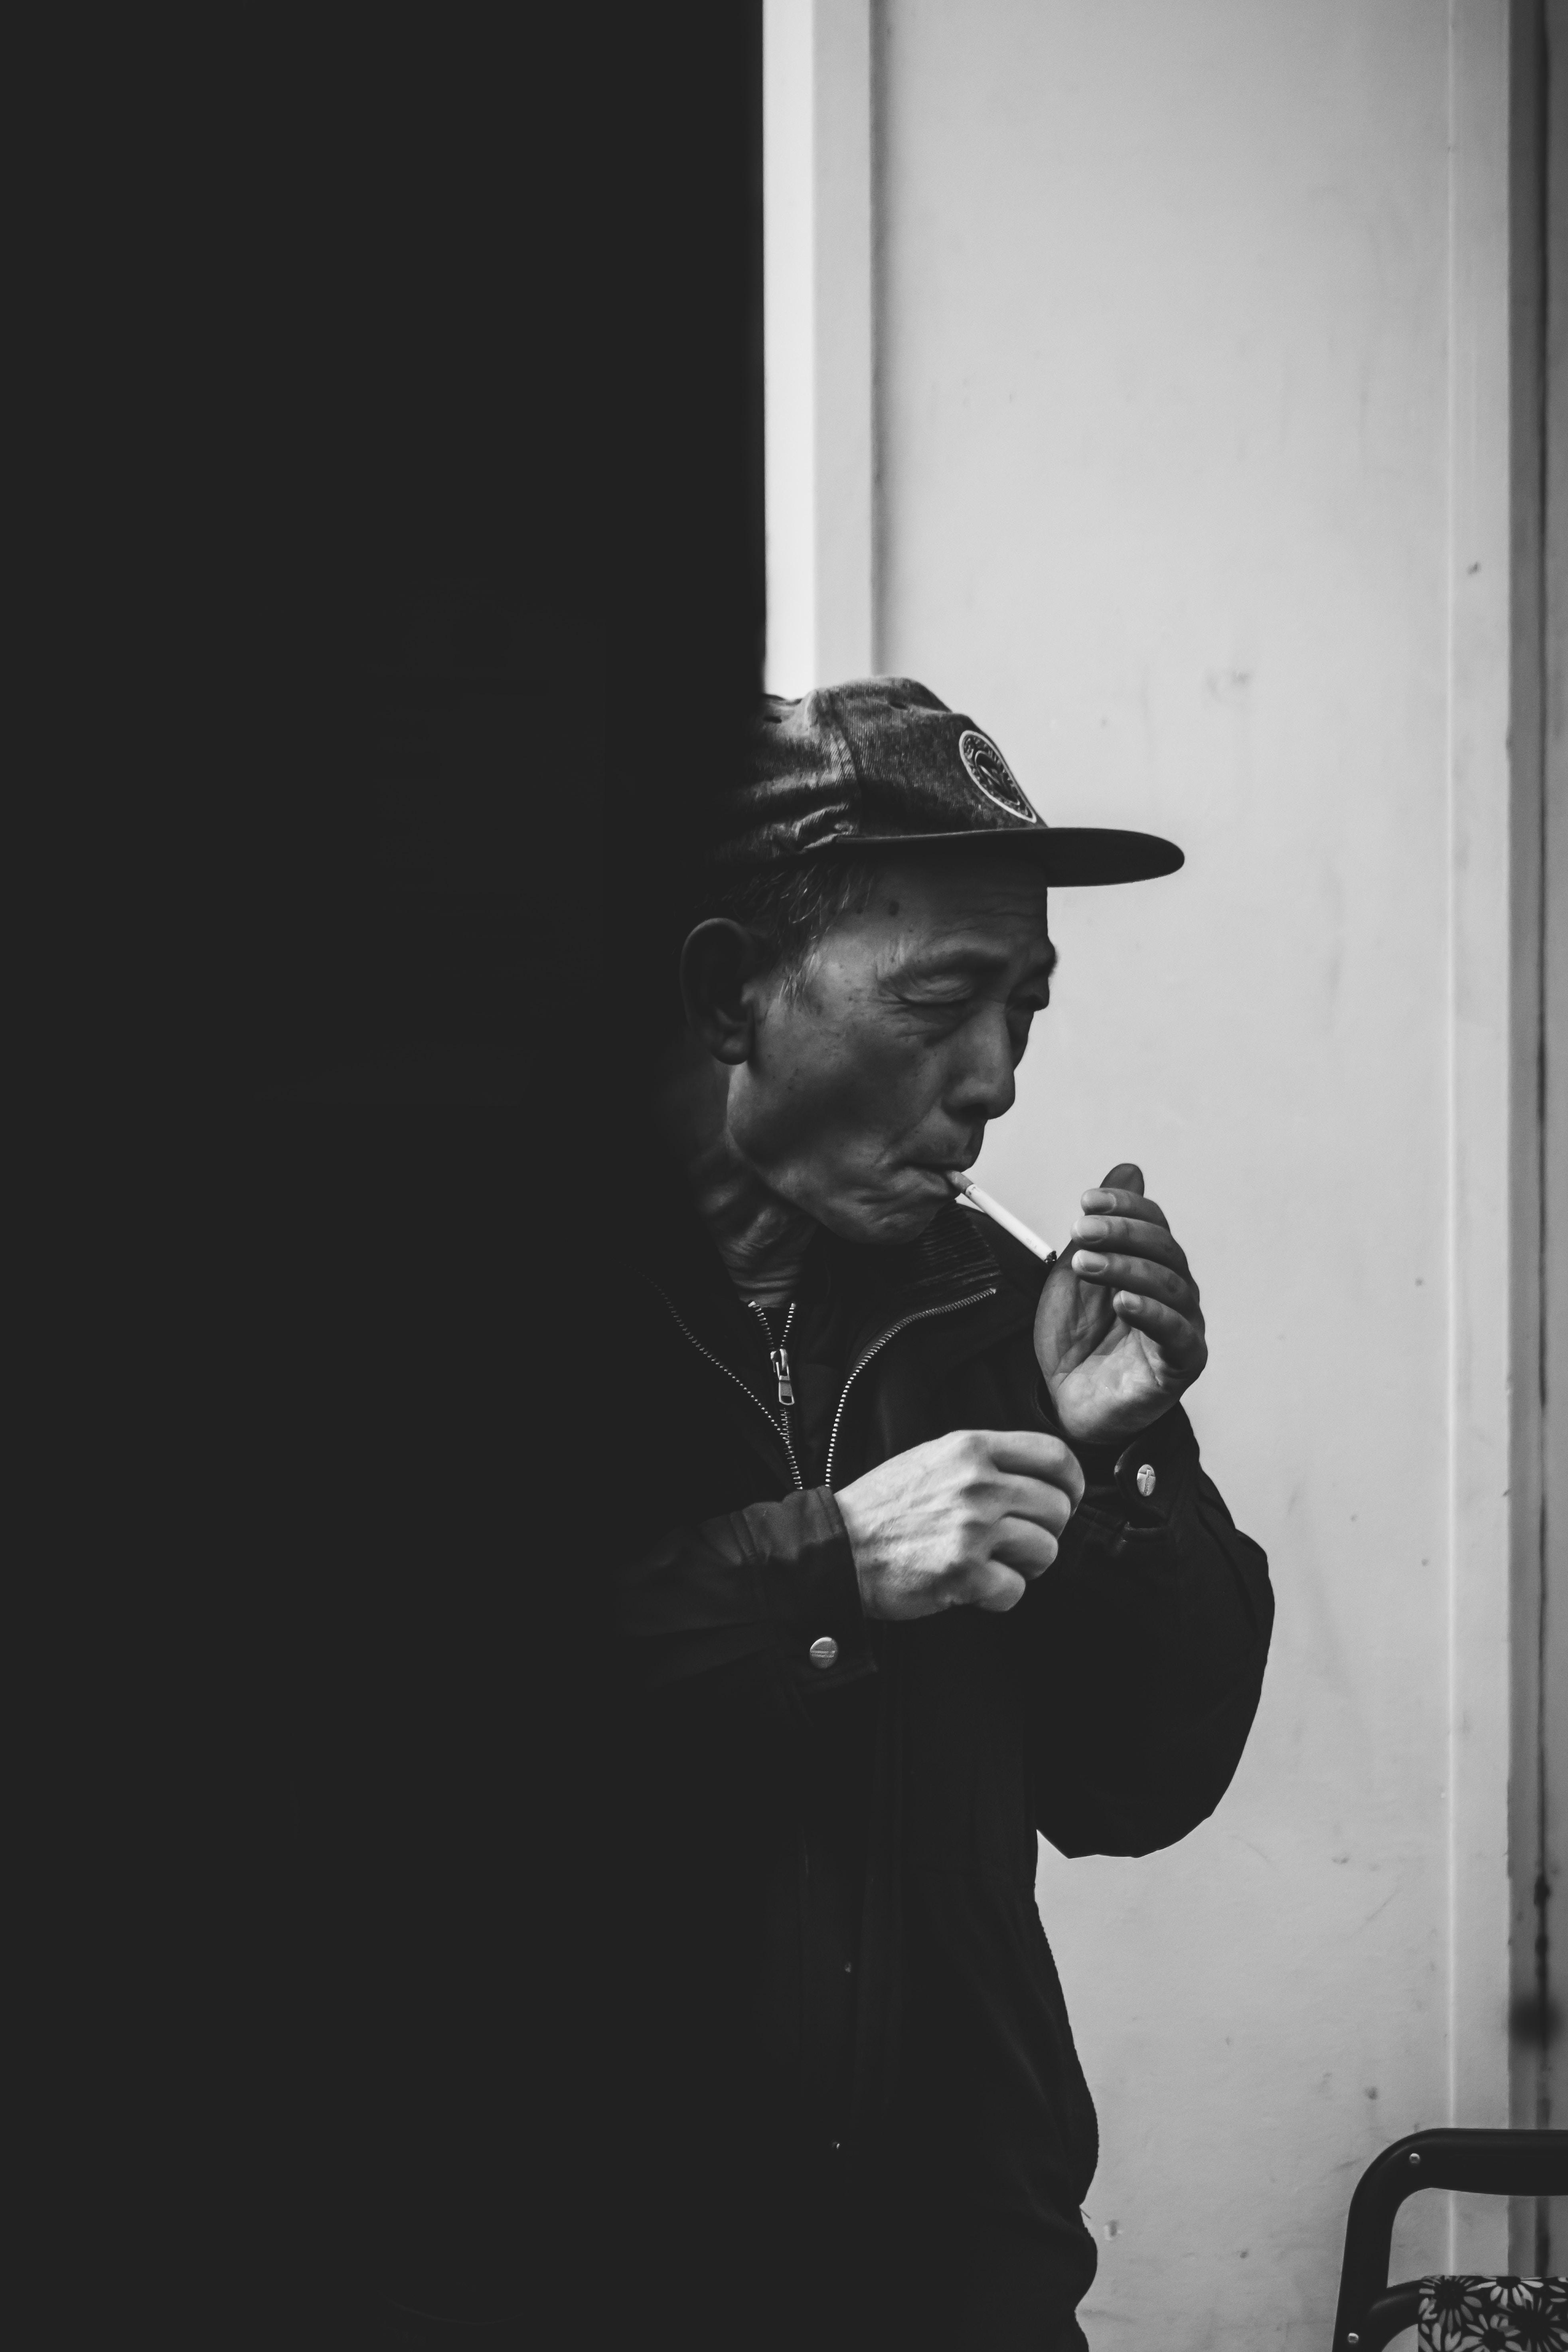 man lighting cigarette stick